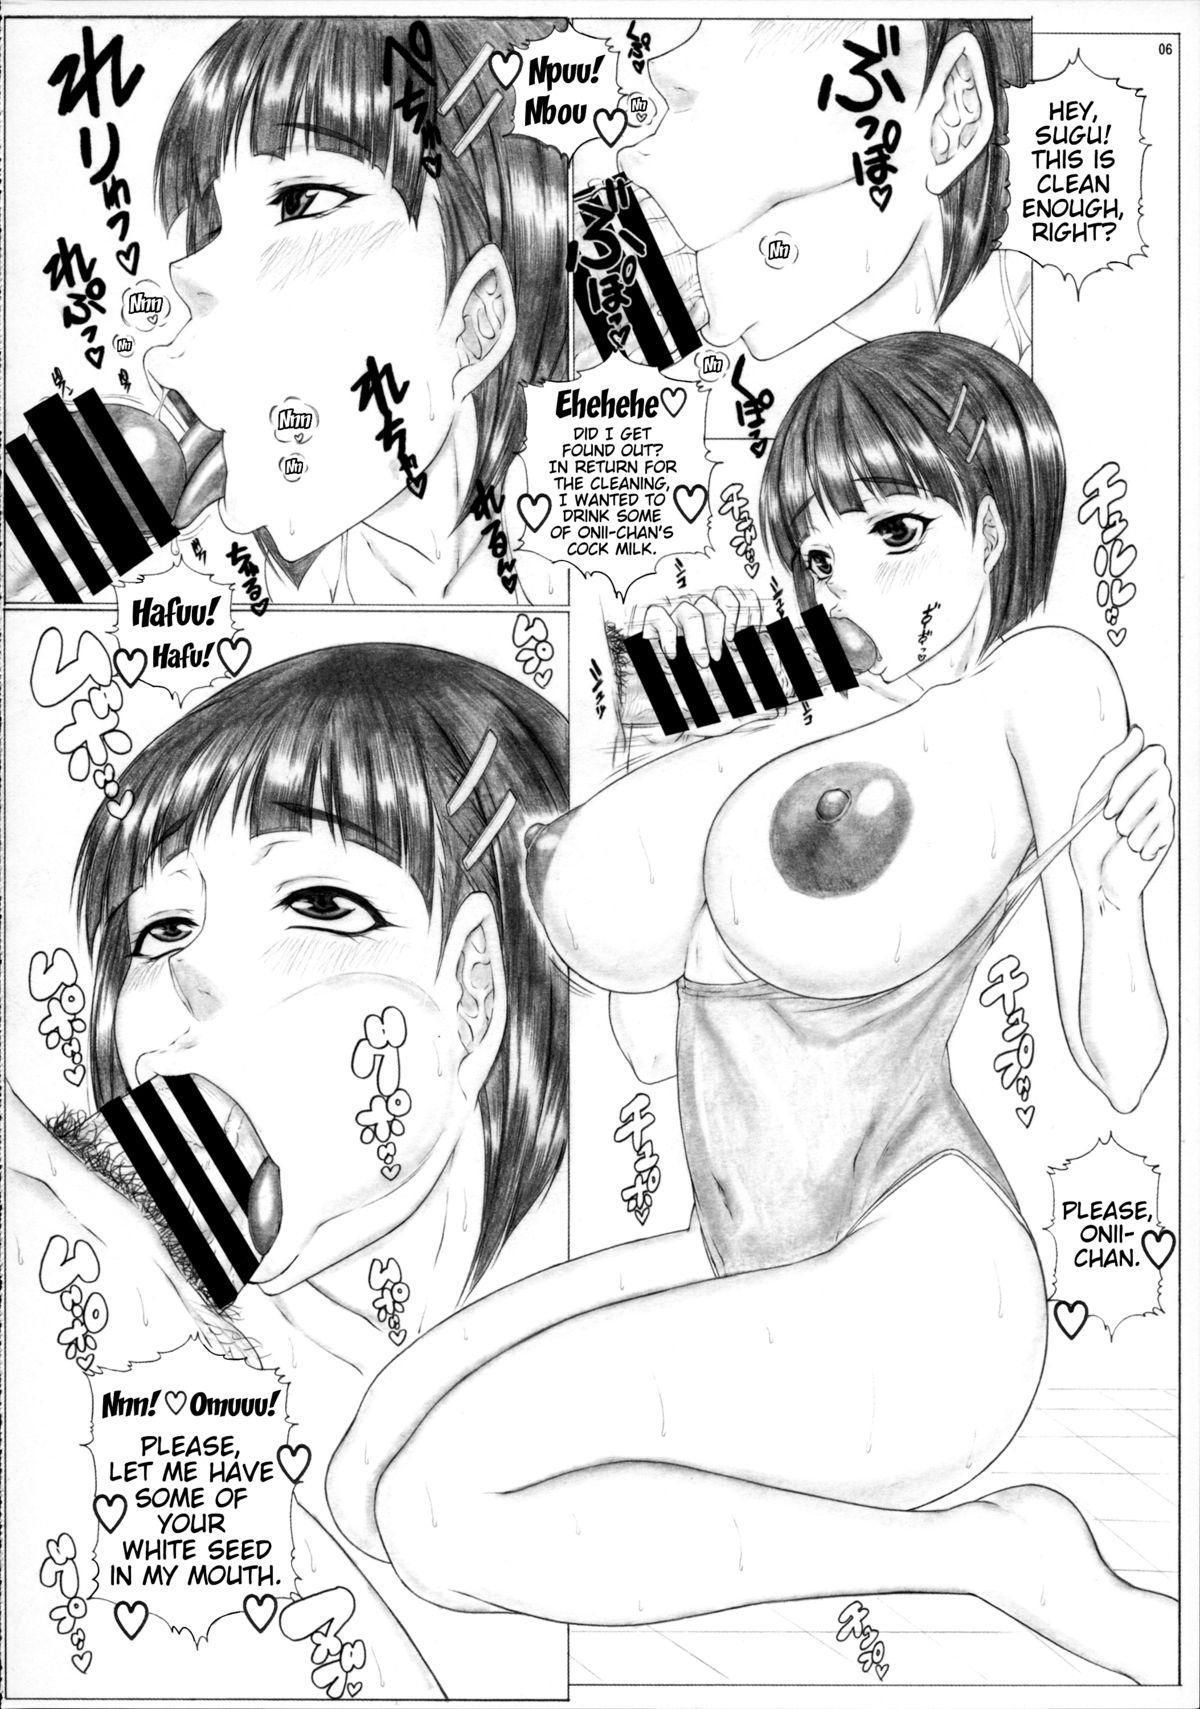 Angel's stroke 81 Suguha Scramble! 2 Oniichan no Seiyoku Kanri | Suguha Scramble! 2 Onii-chan's Libido Management 6